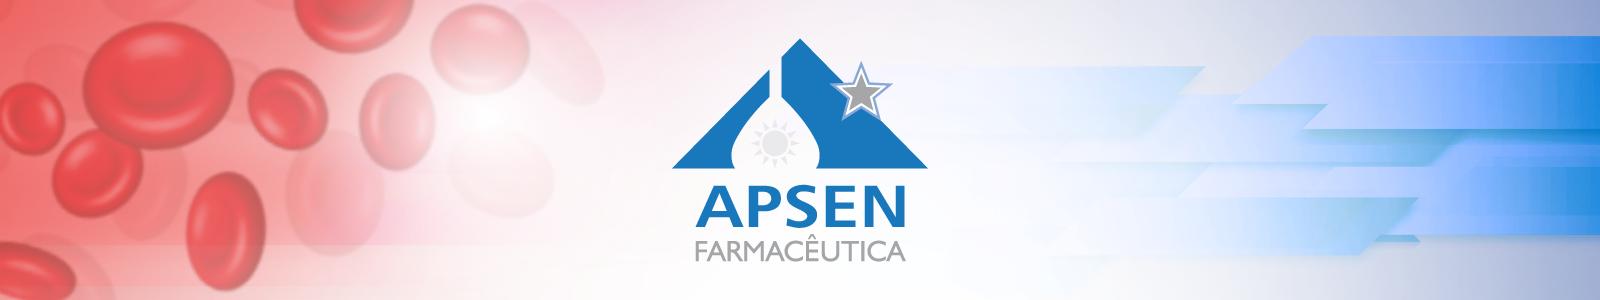 Diacordis2021-BANNER-Apsen